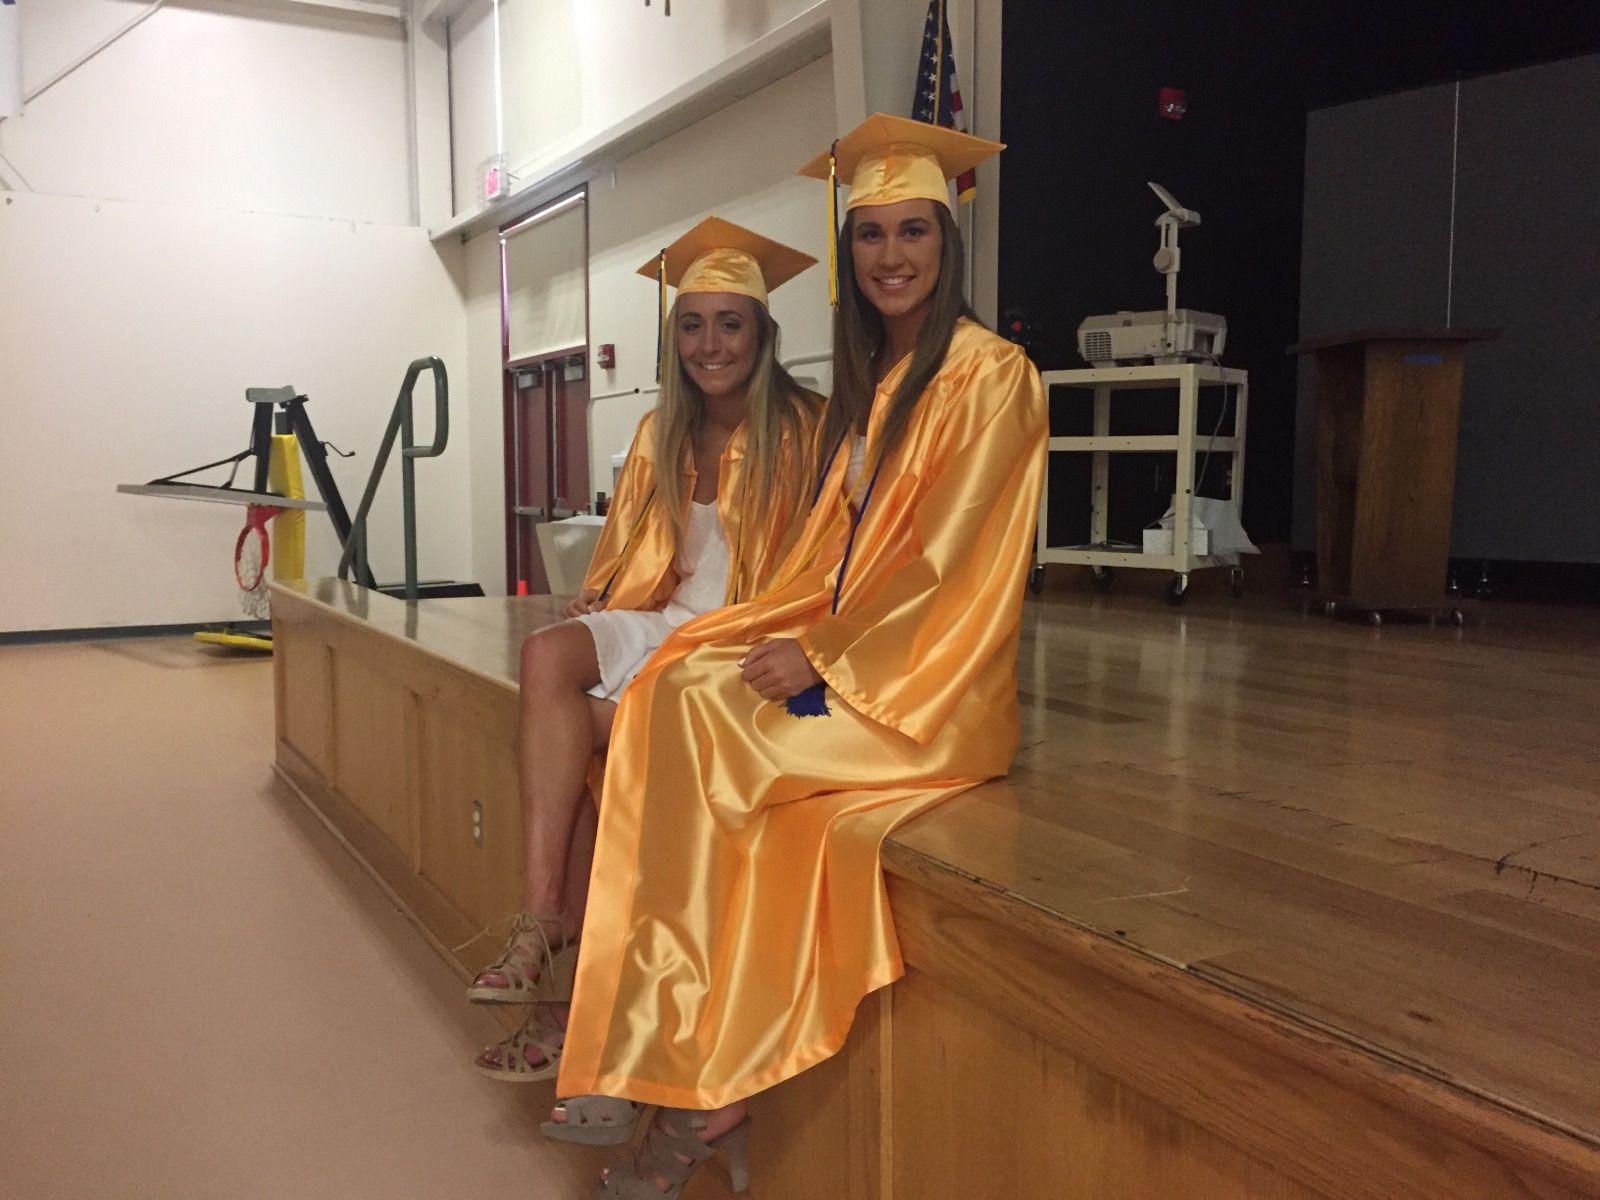 hight resolution of Holy Spirit High School graduates 96 in Galloway   Education    pressofatlanticcity.com